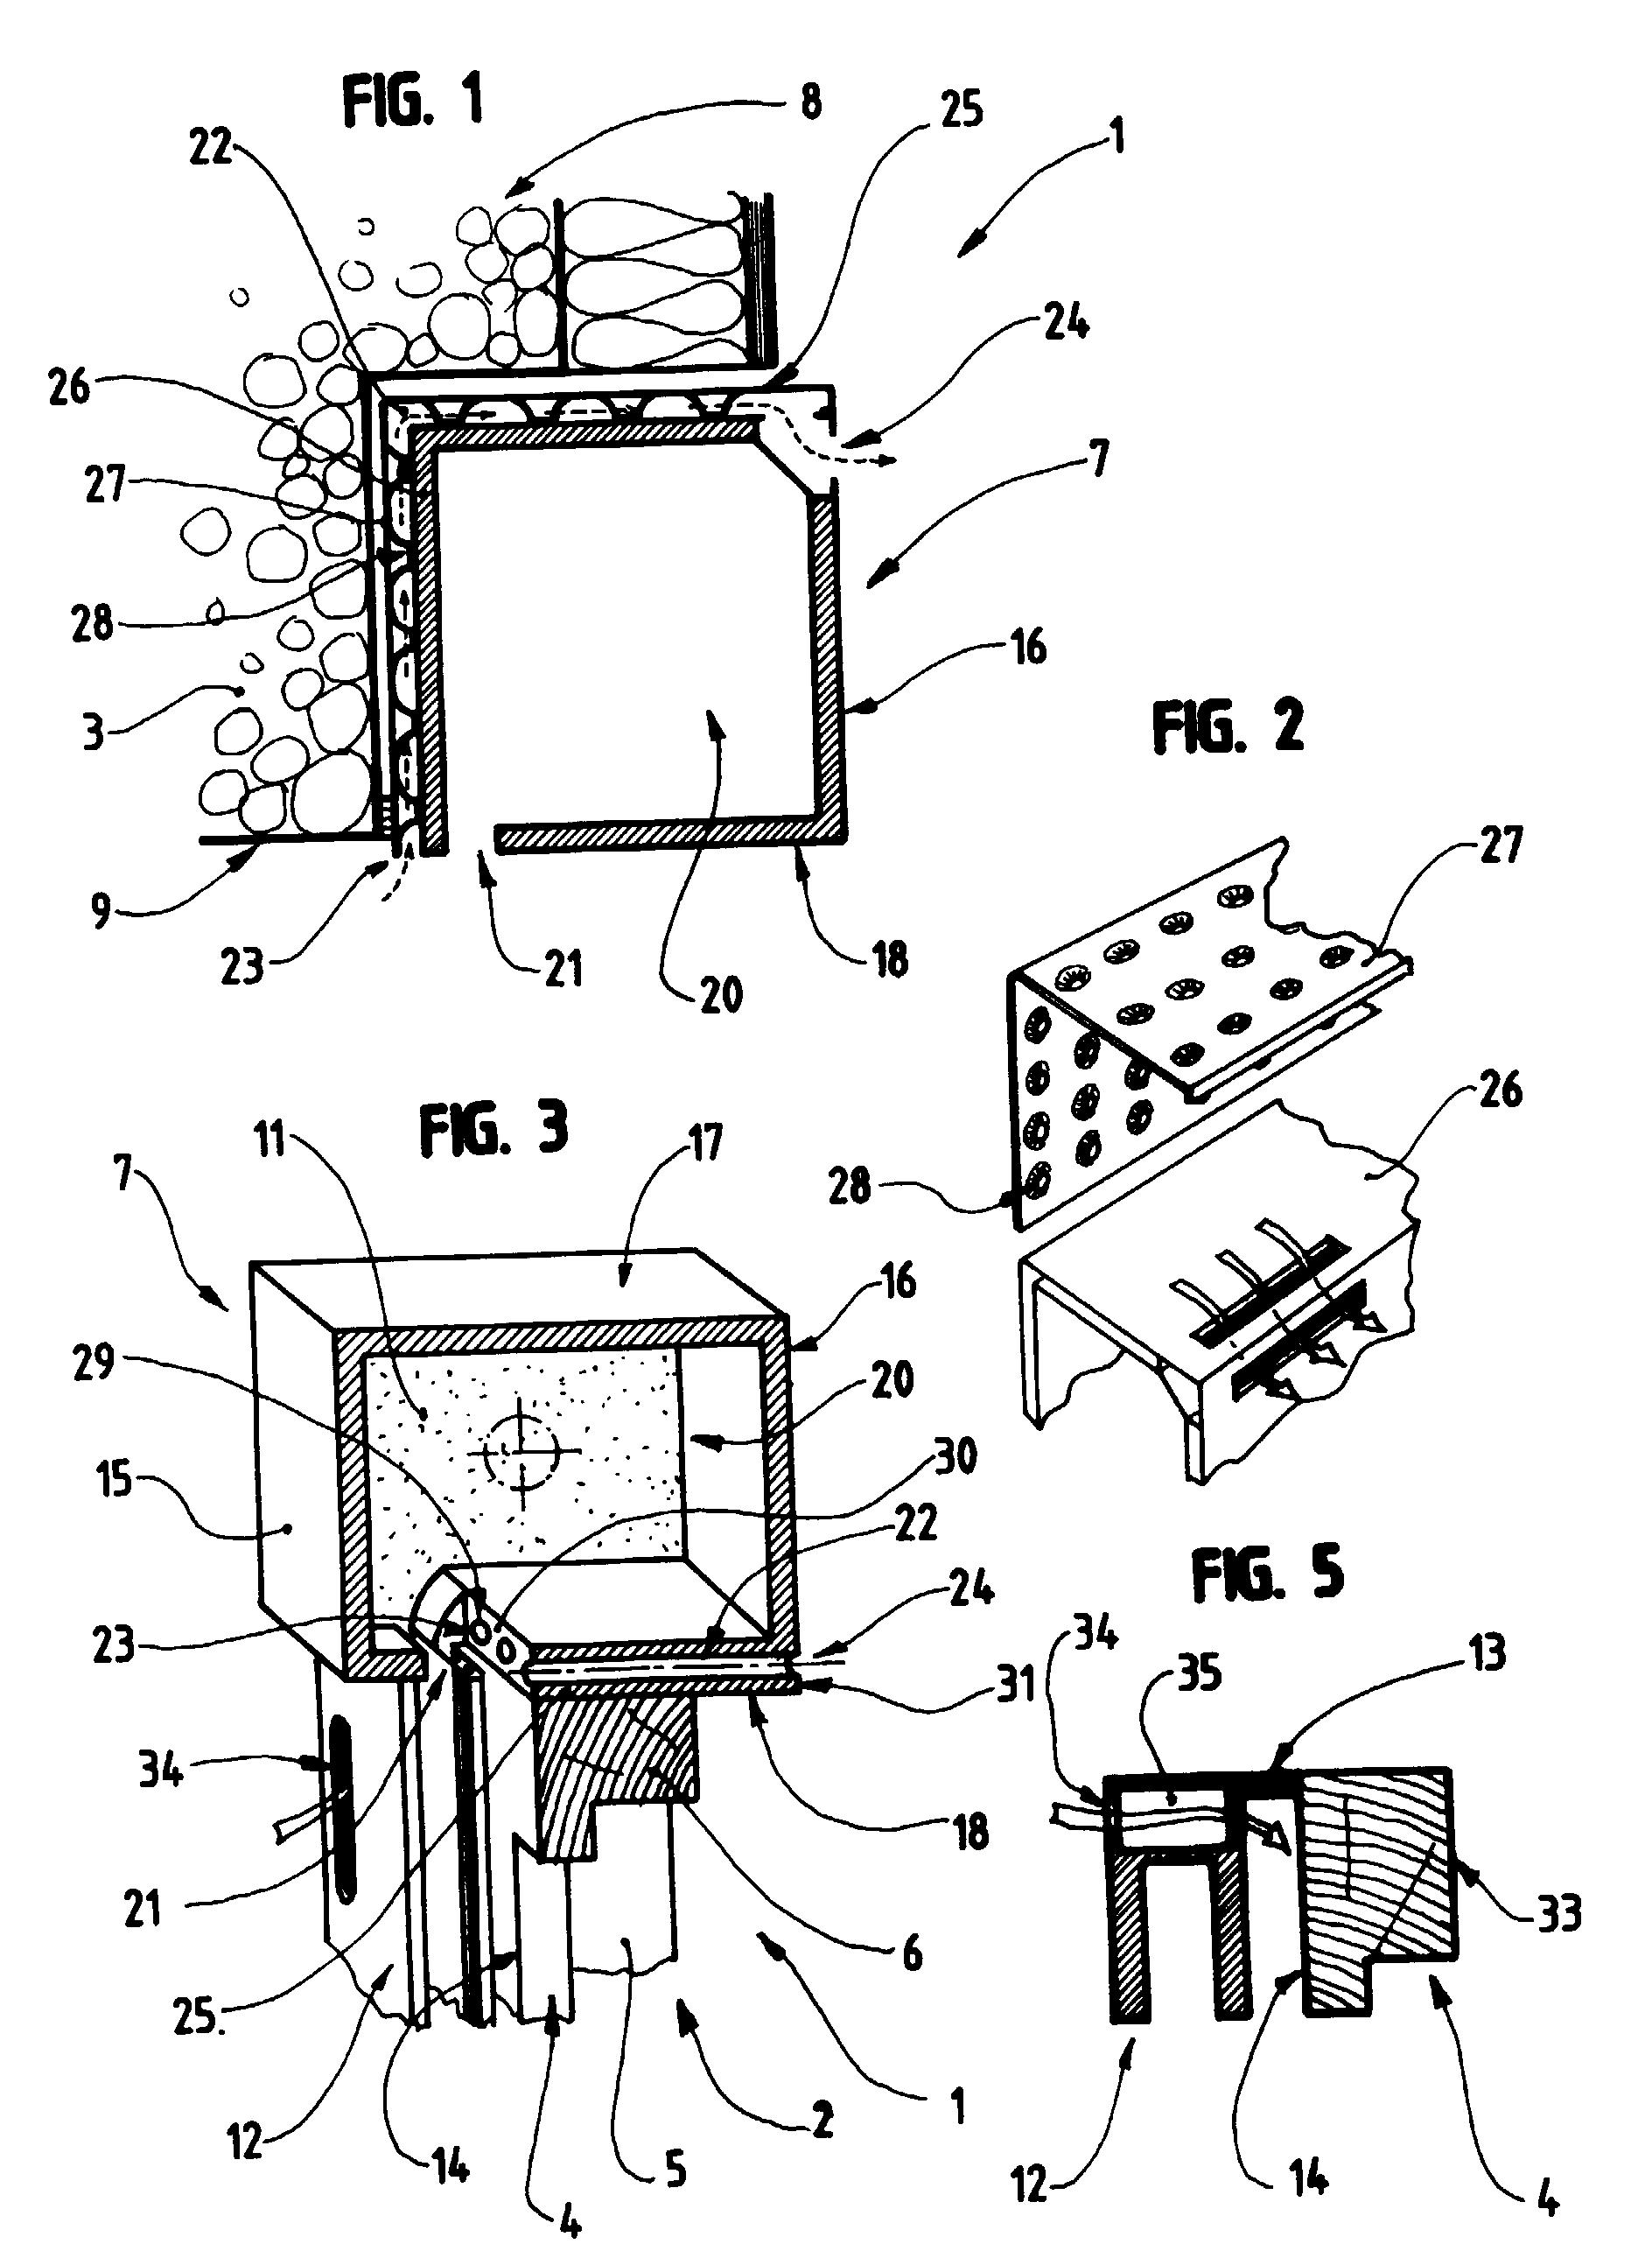 Volets electriques bubendorff service